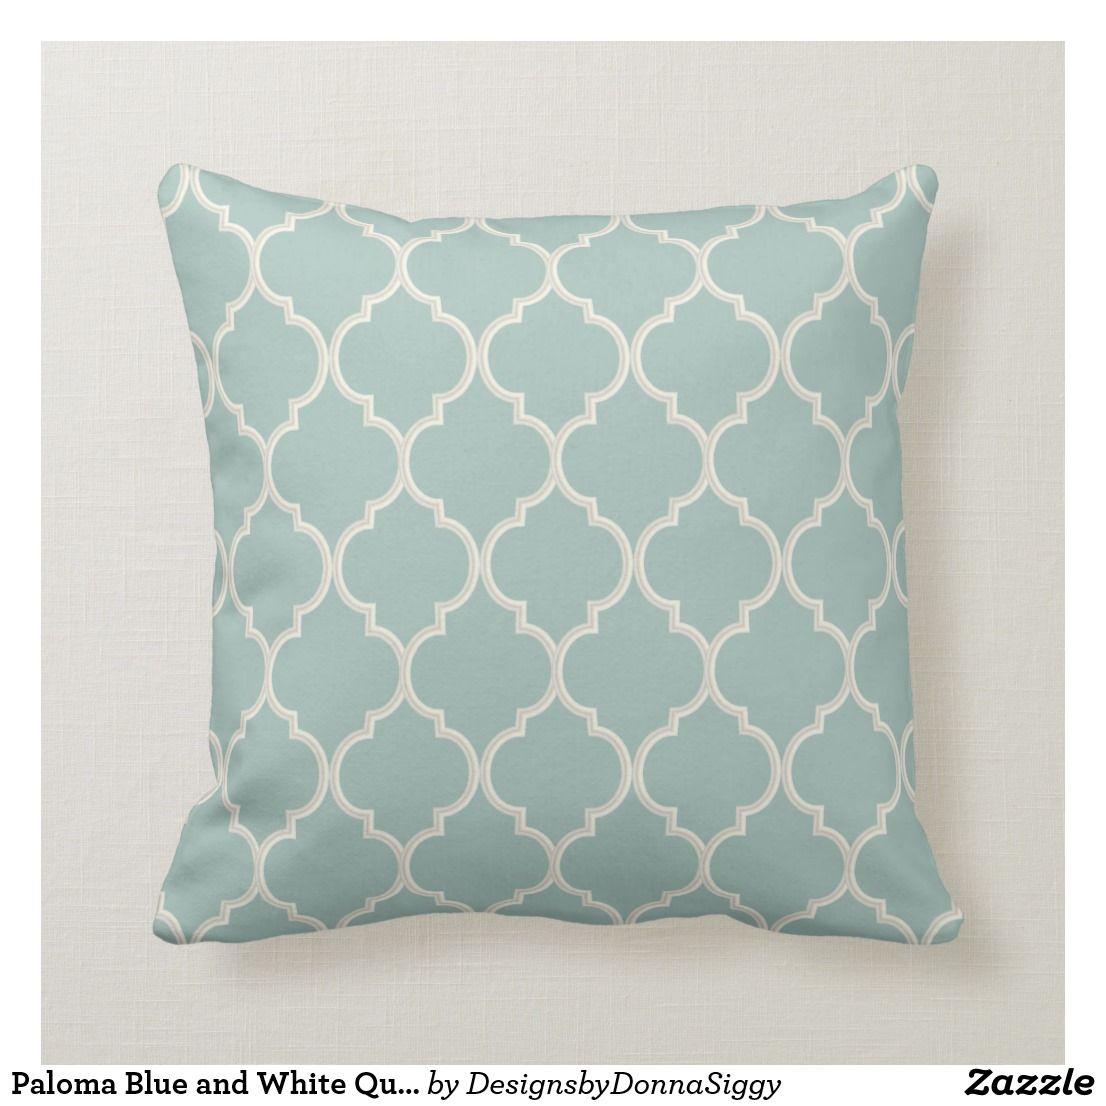 Paloma Blue And White Quatrefoil Pattern Throw Pillow Zazzle Com